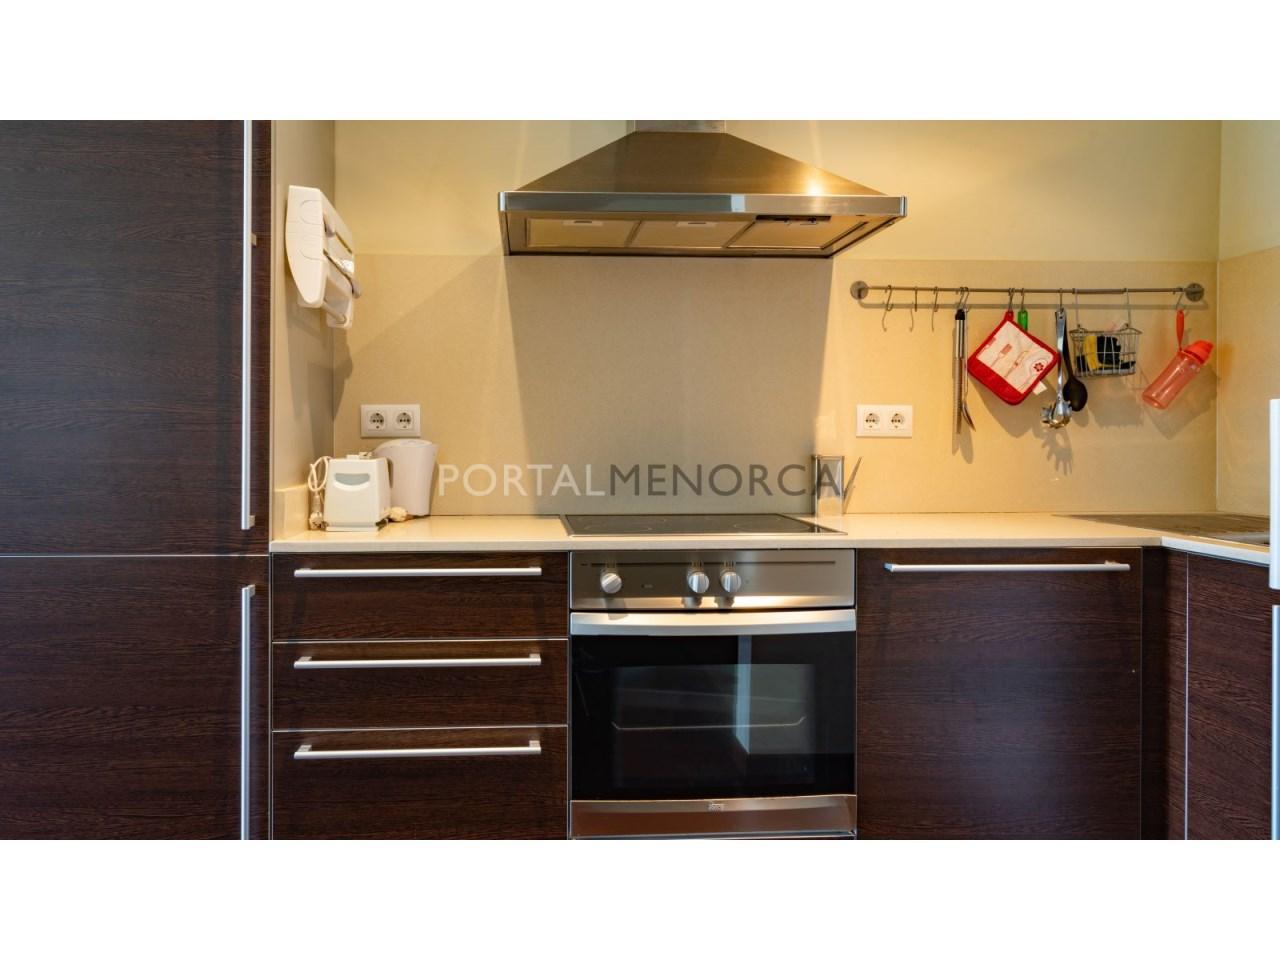 acheter-appartement-menorca (1)